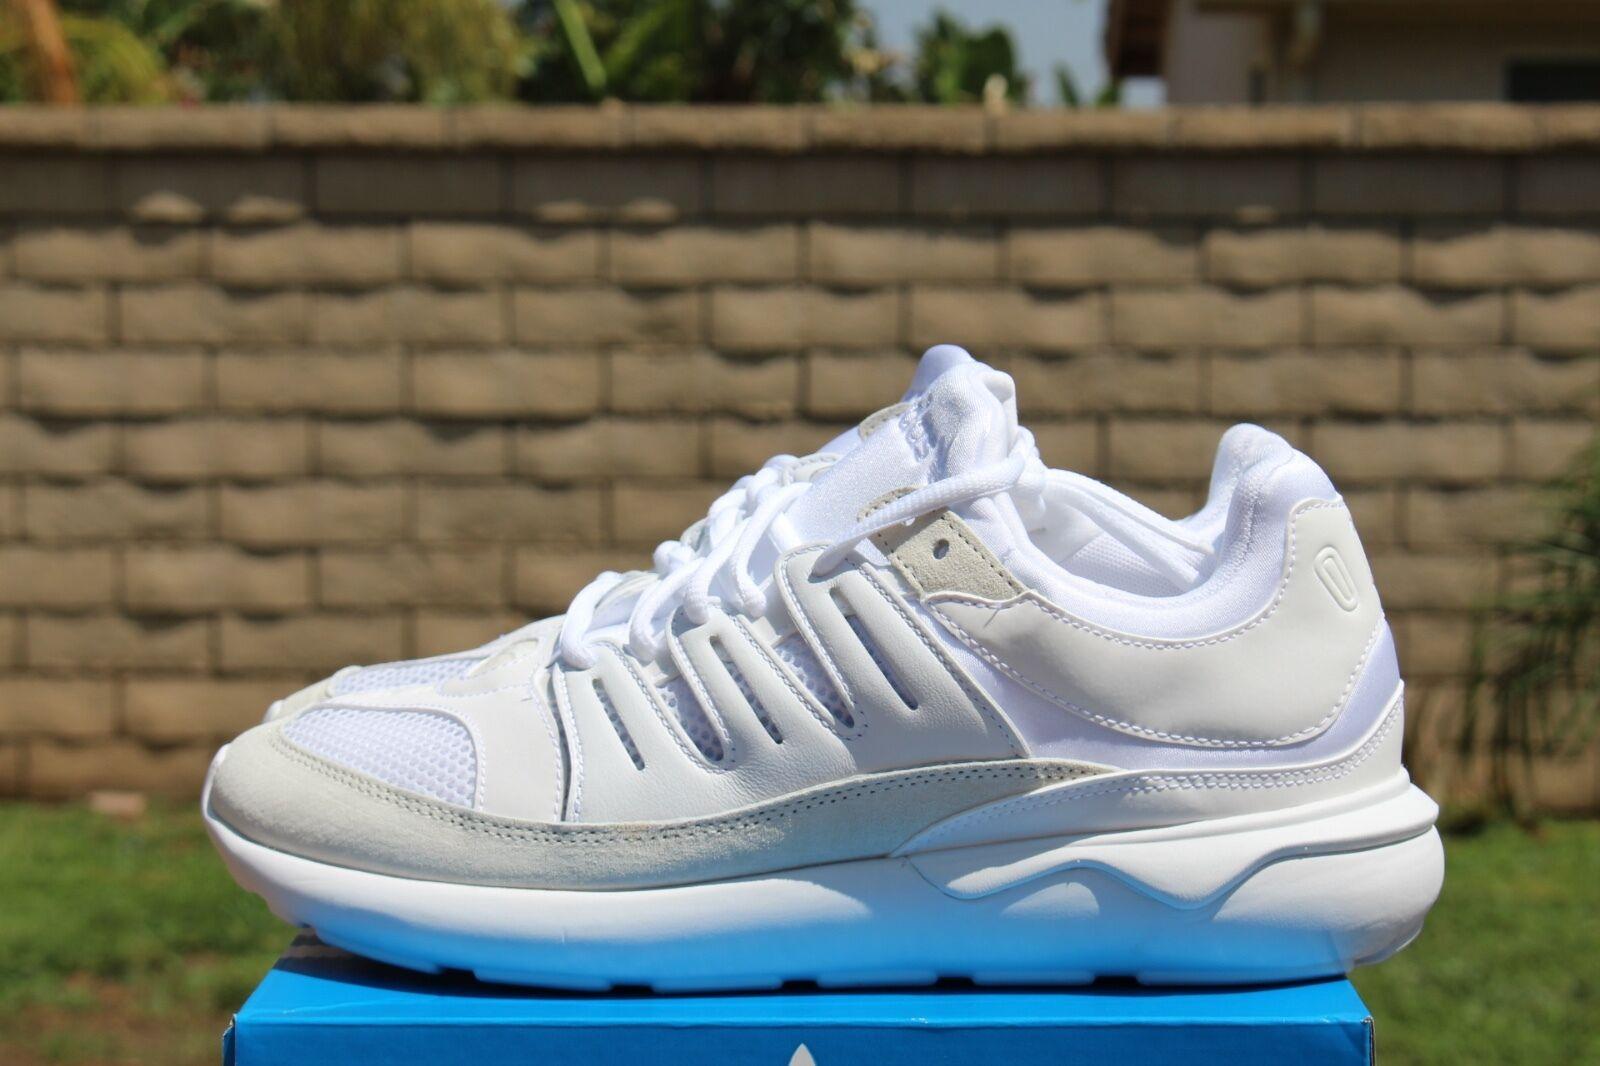 Adidas Tubular 93 Sz 12 Atletismo Blanco Blanco S82513 Roto S82513 Blanco 6ee85f